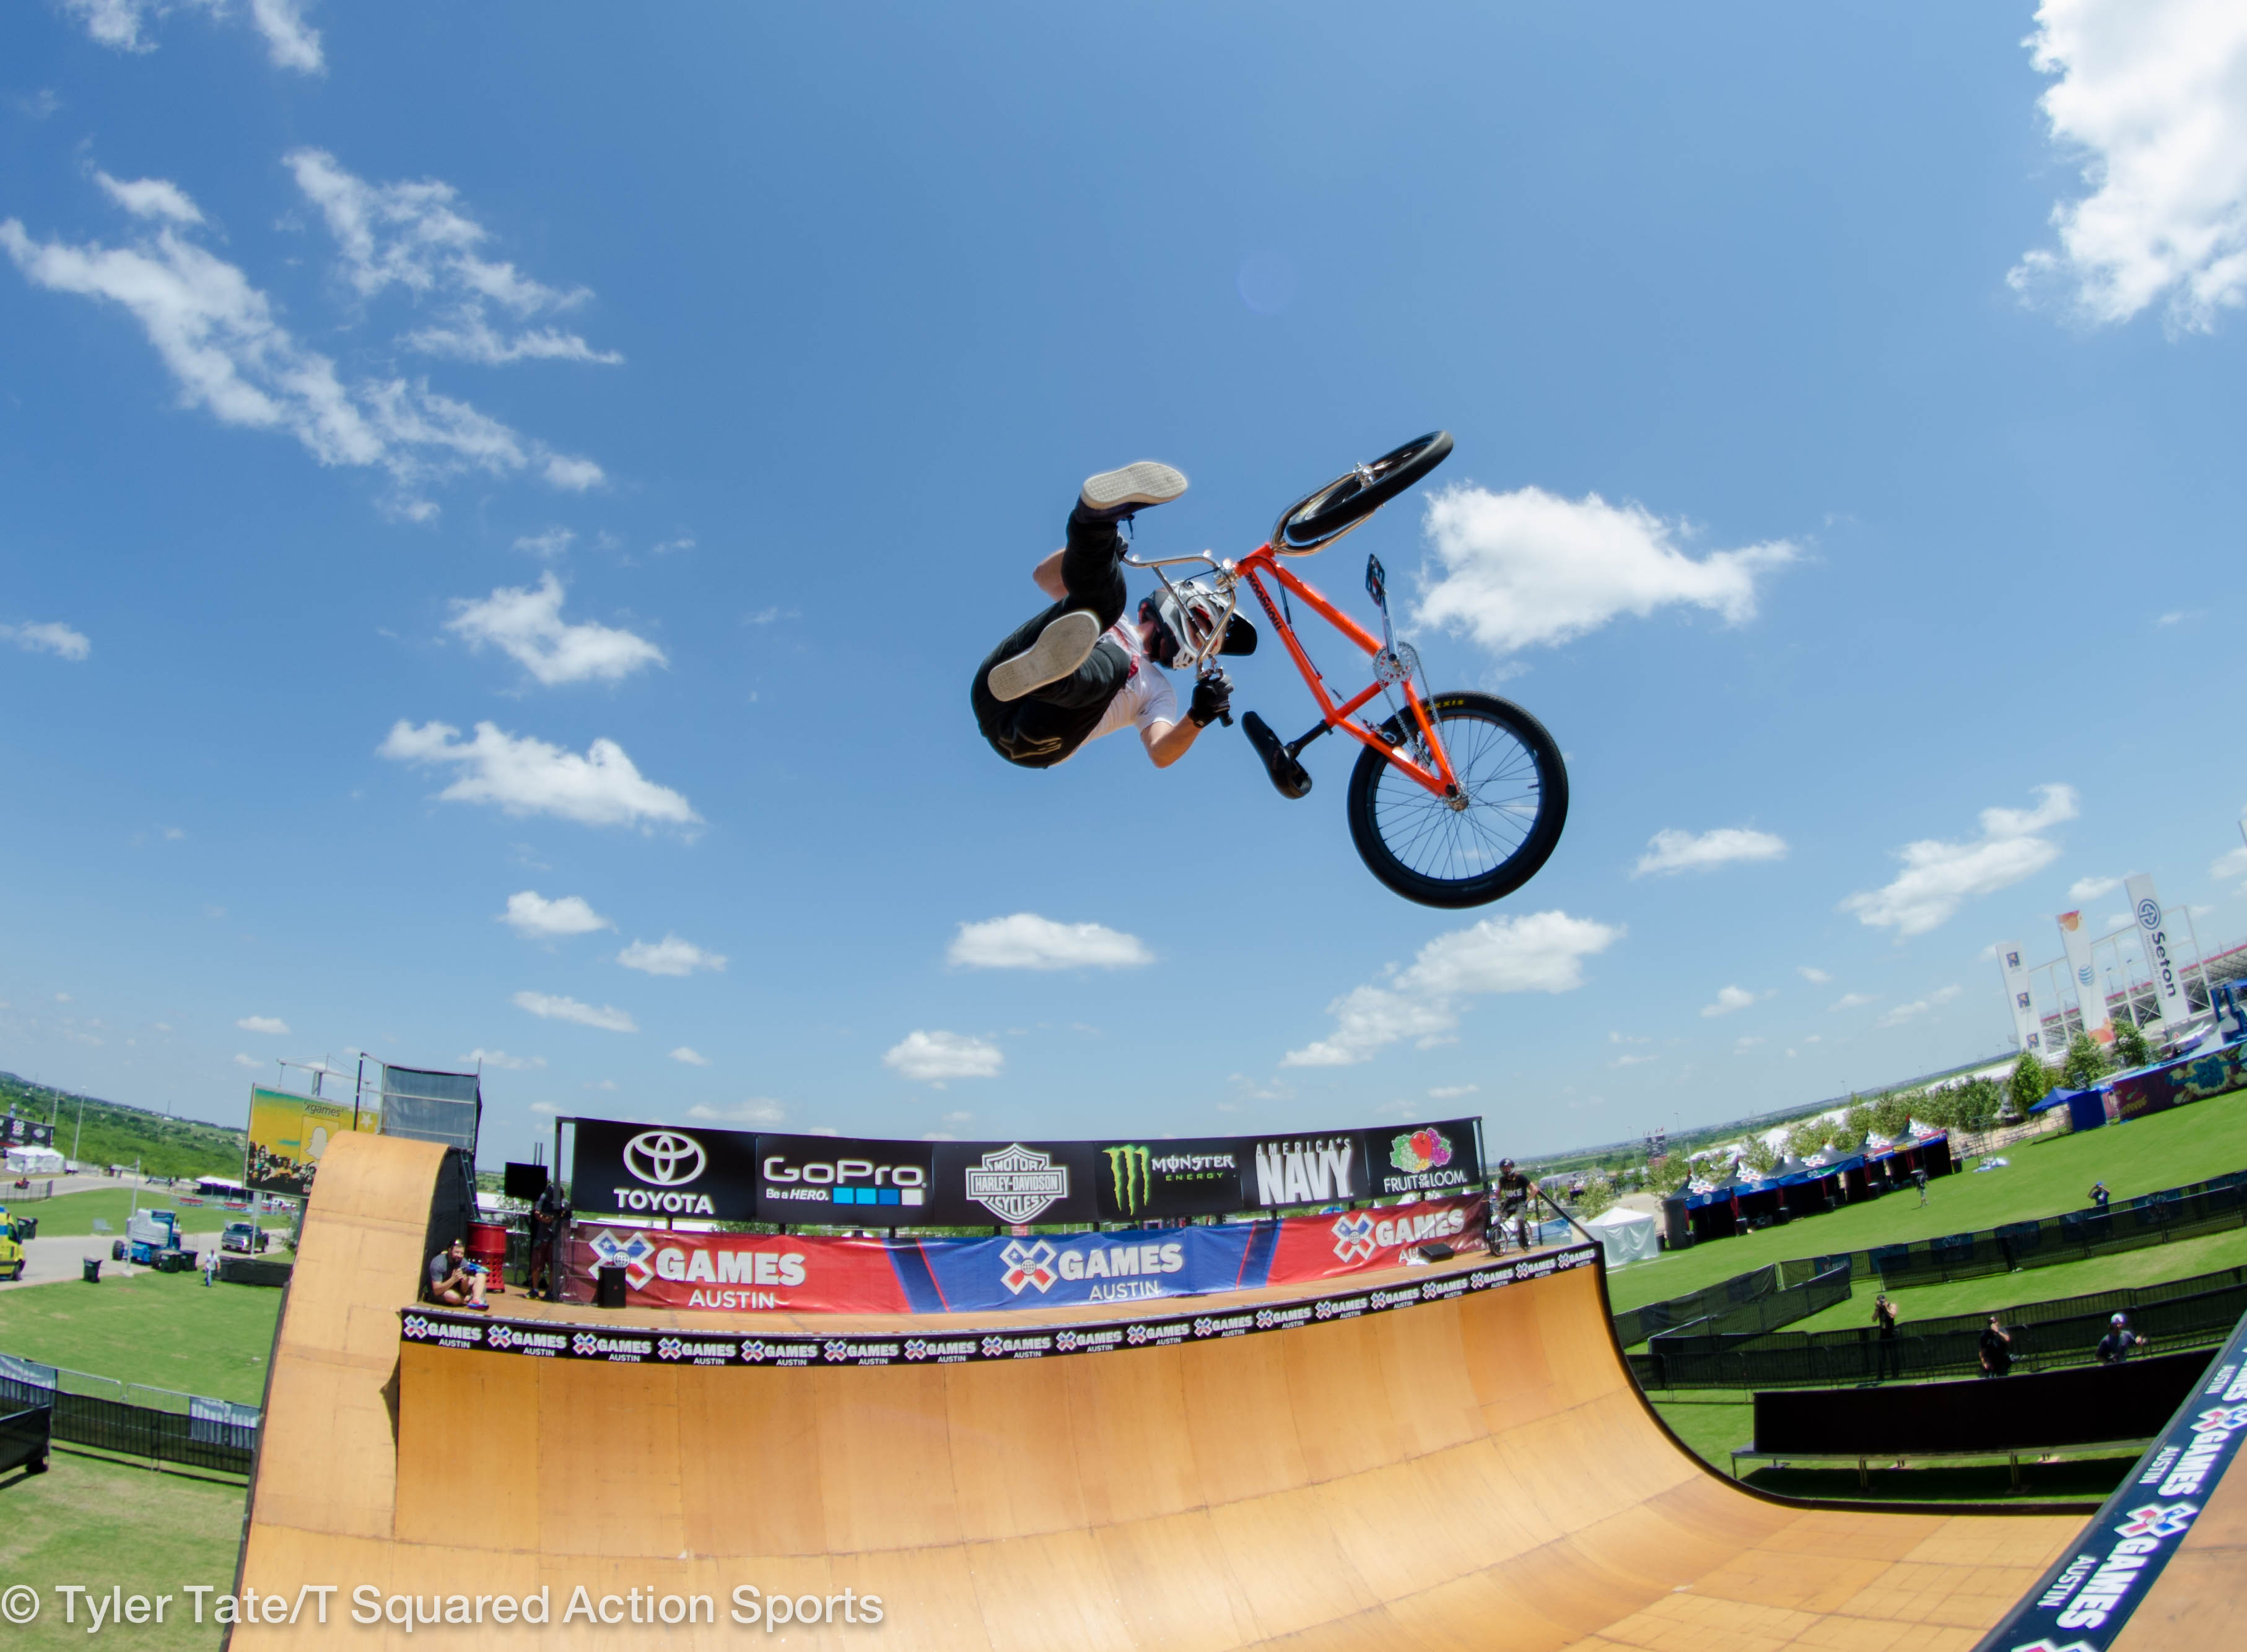 Steve McCann X Games Austin 2015 BMX Vert – T Squared Action Sports